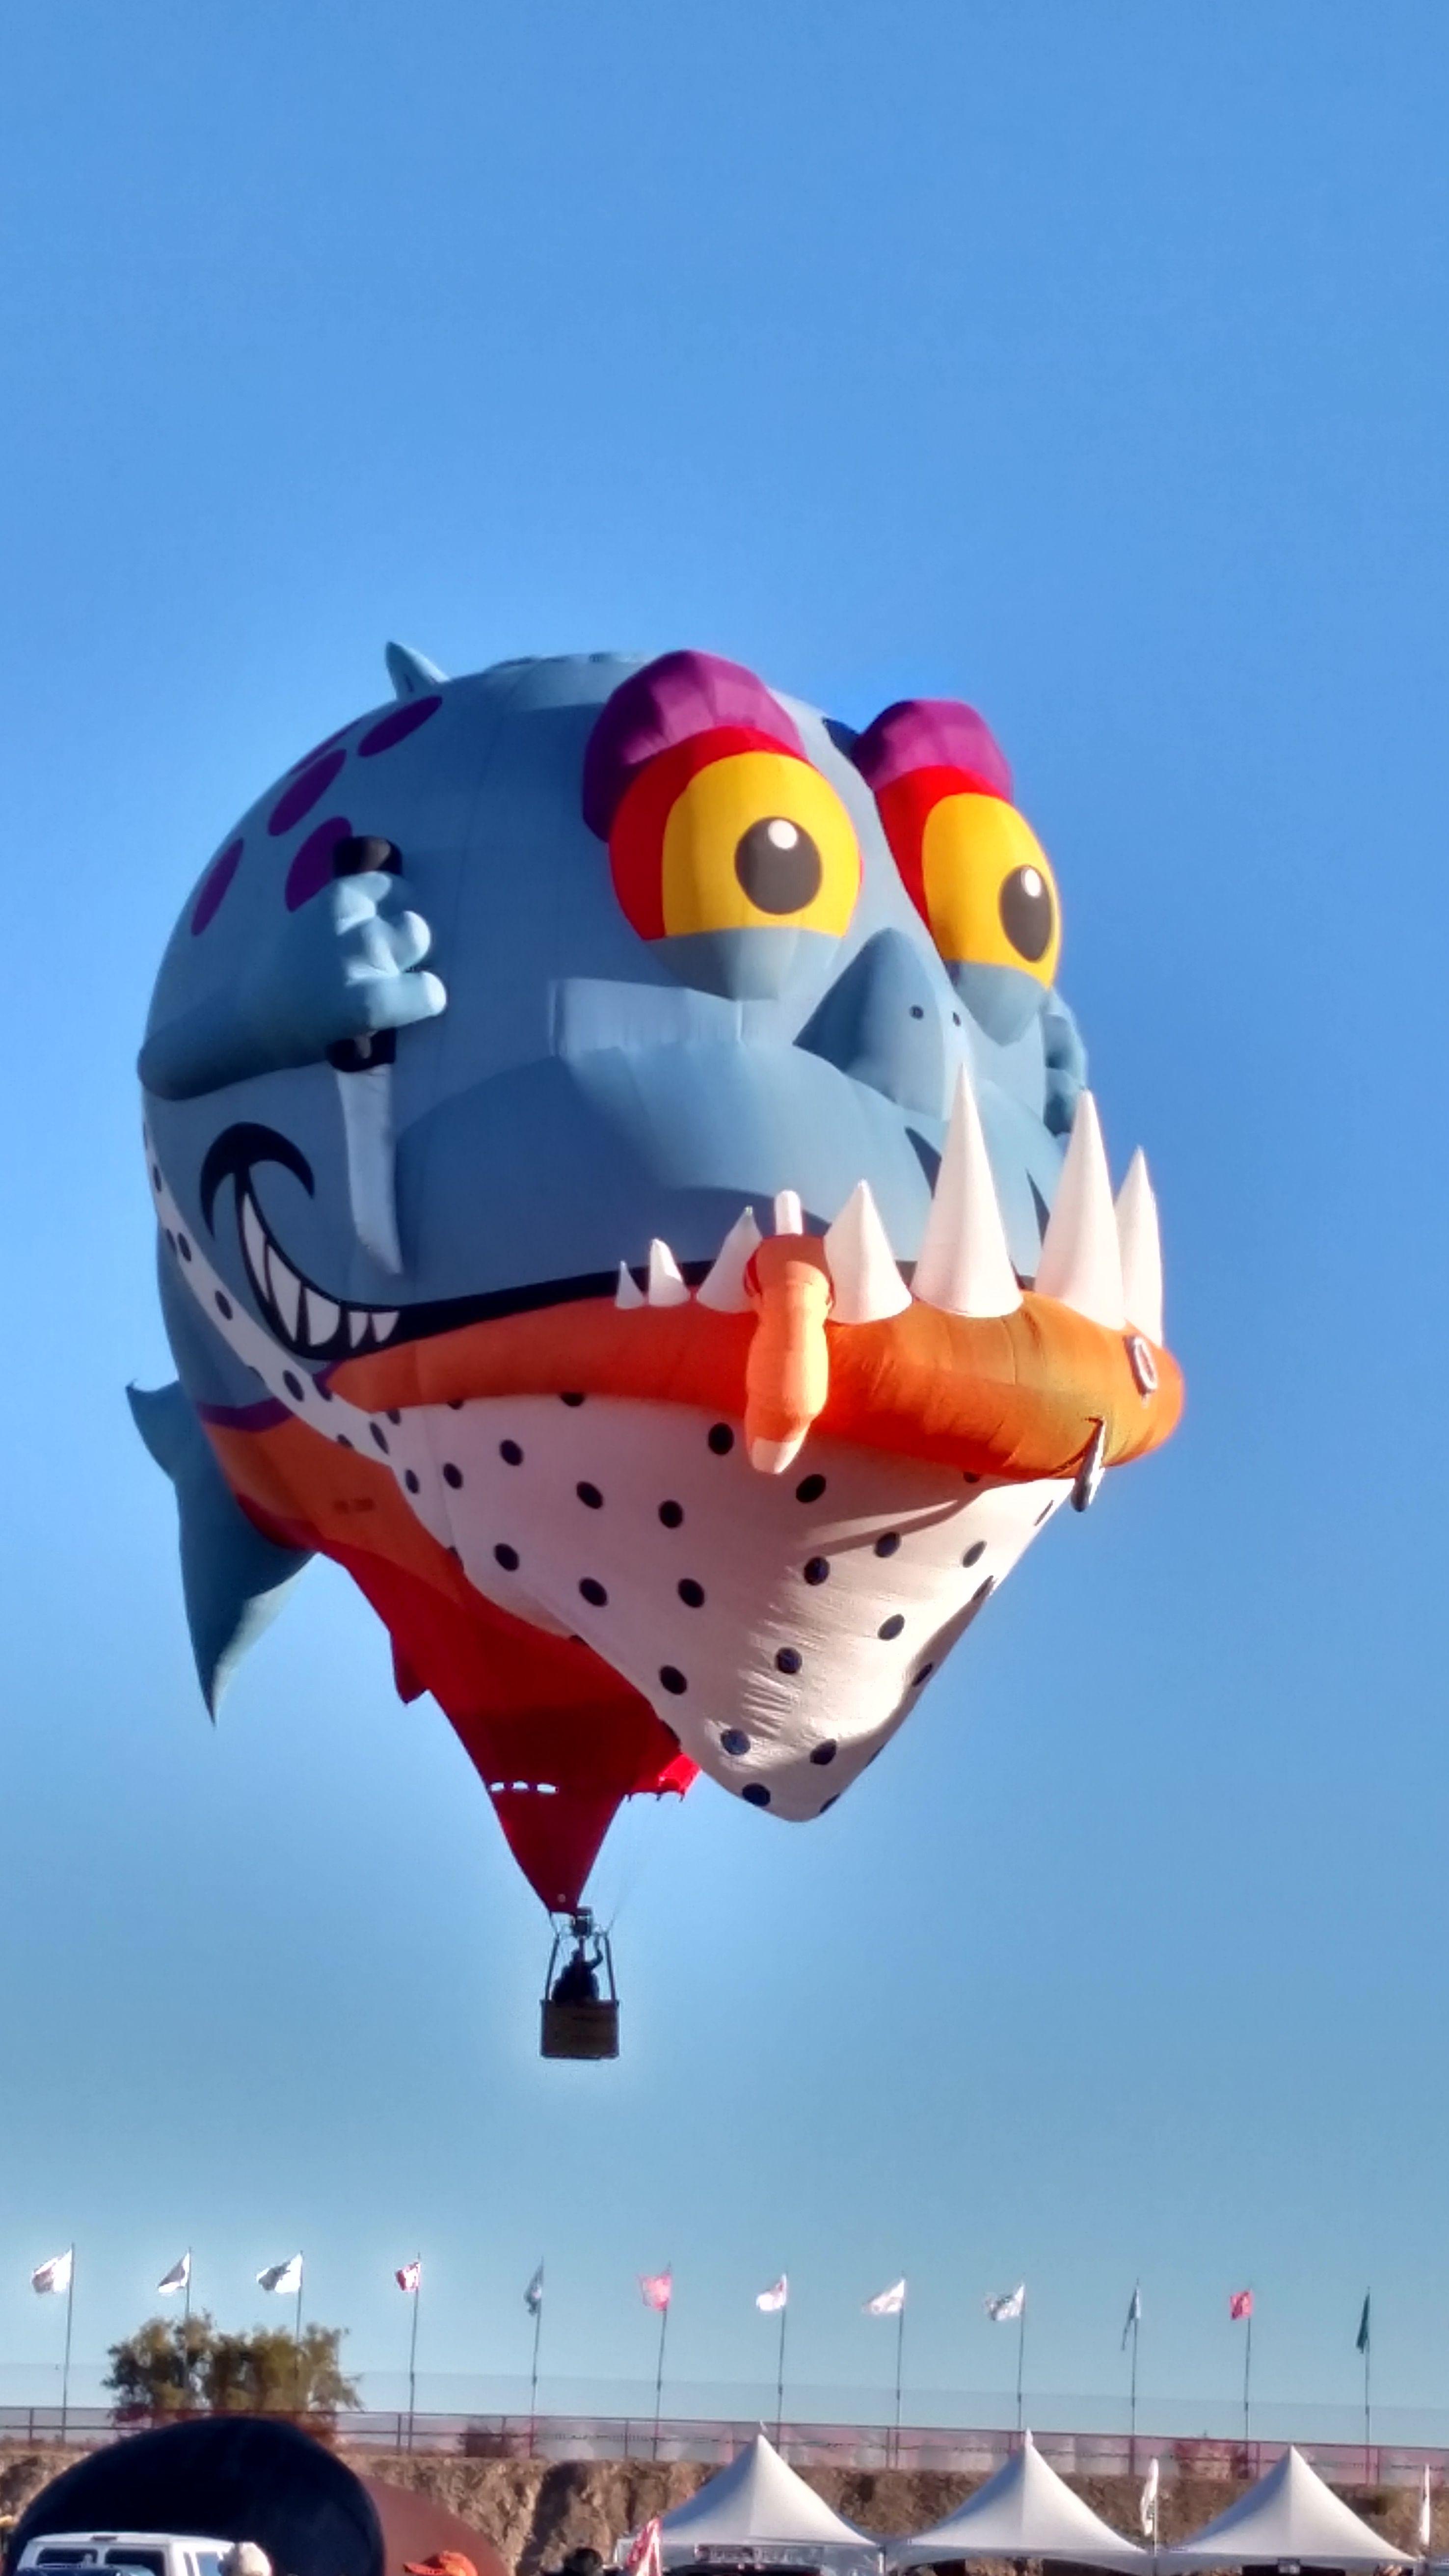 monster balloon Hot air balloon festival, Air balloon